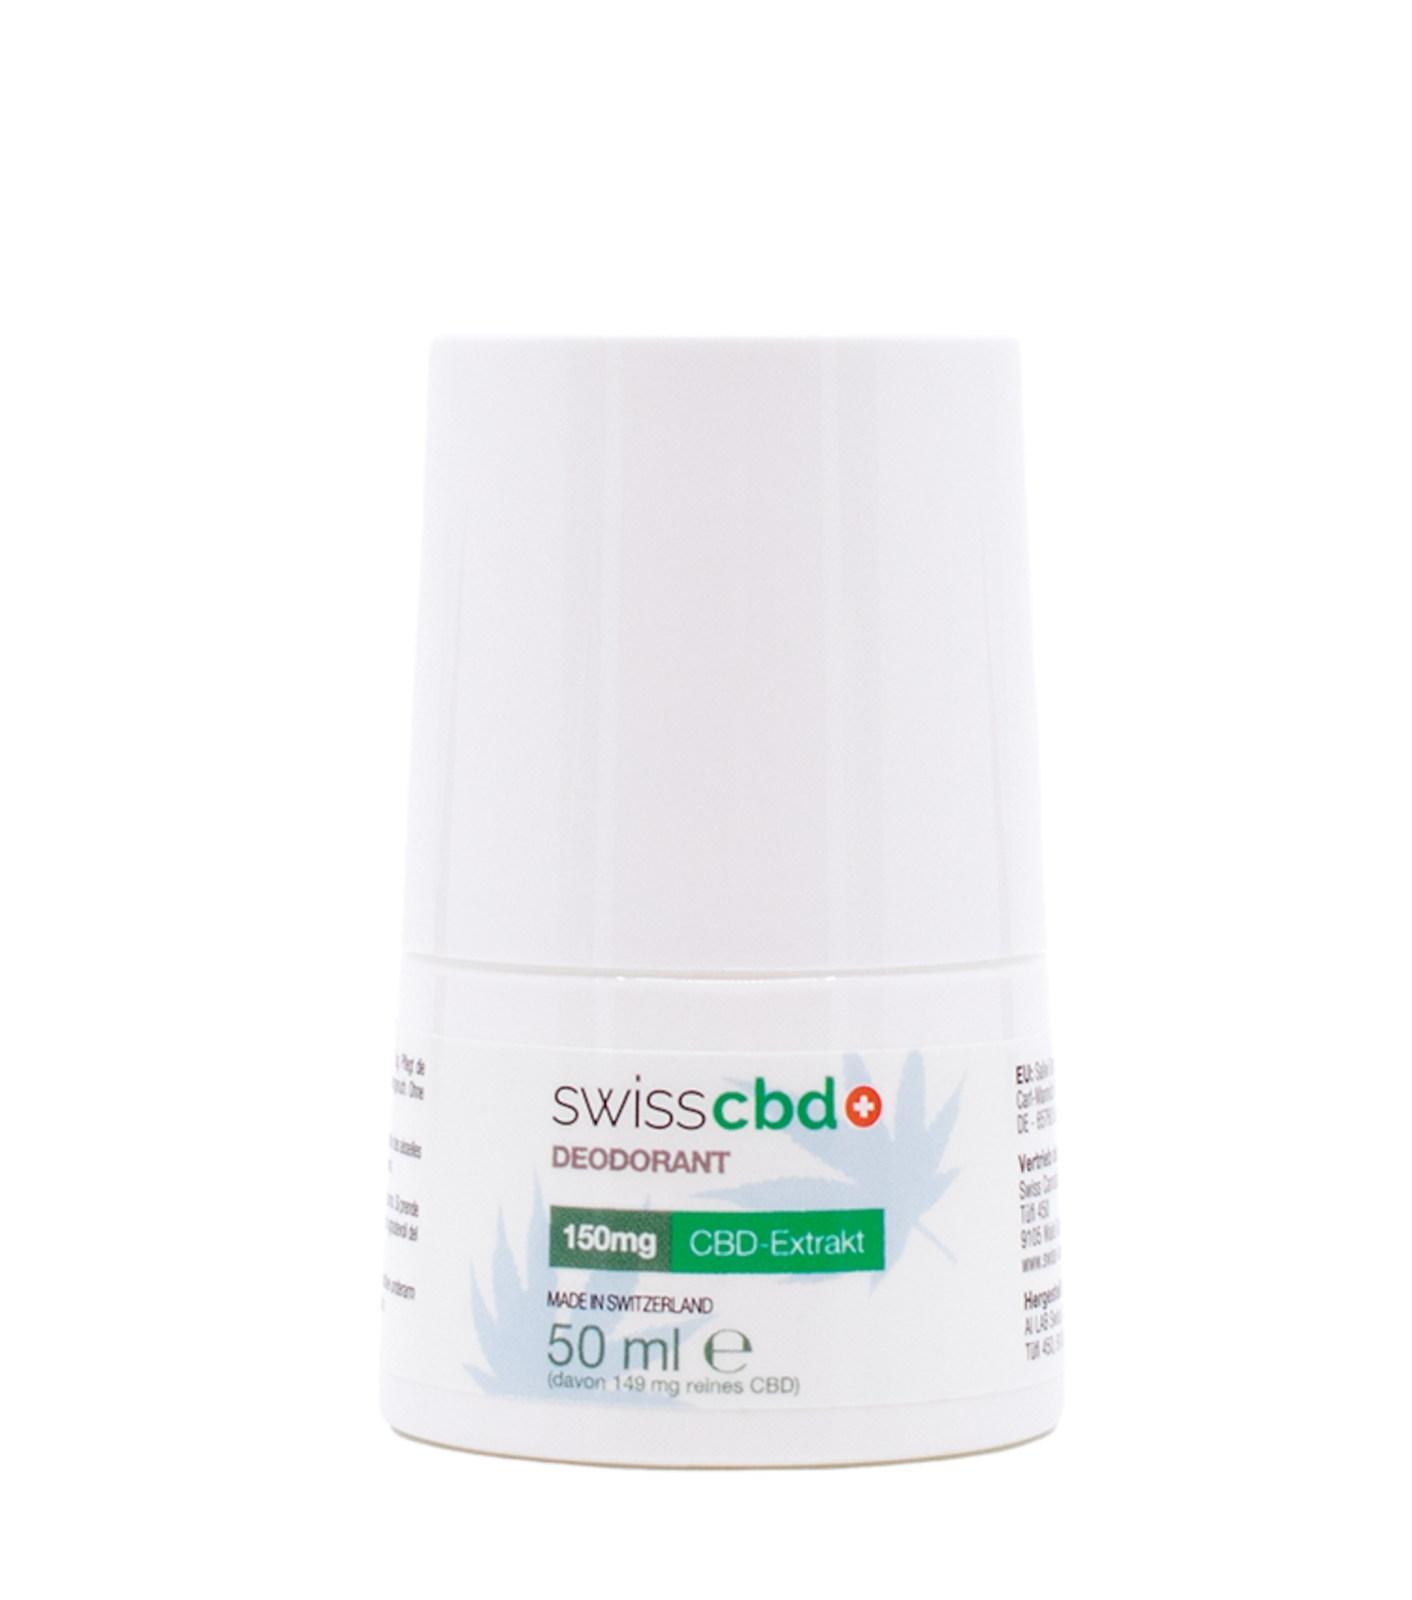 Deodorant - SwissCBD